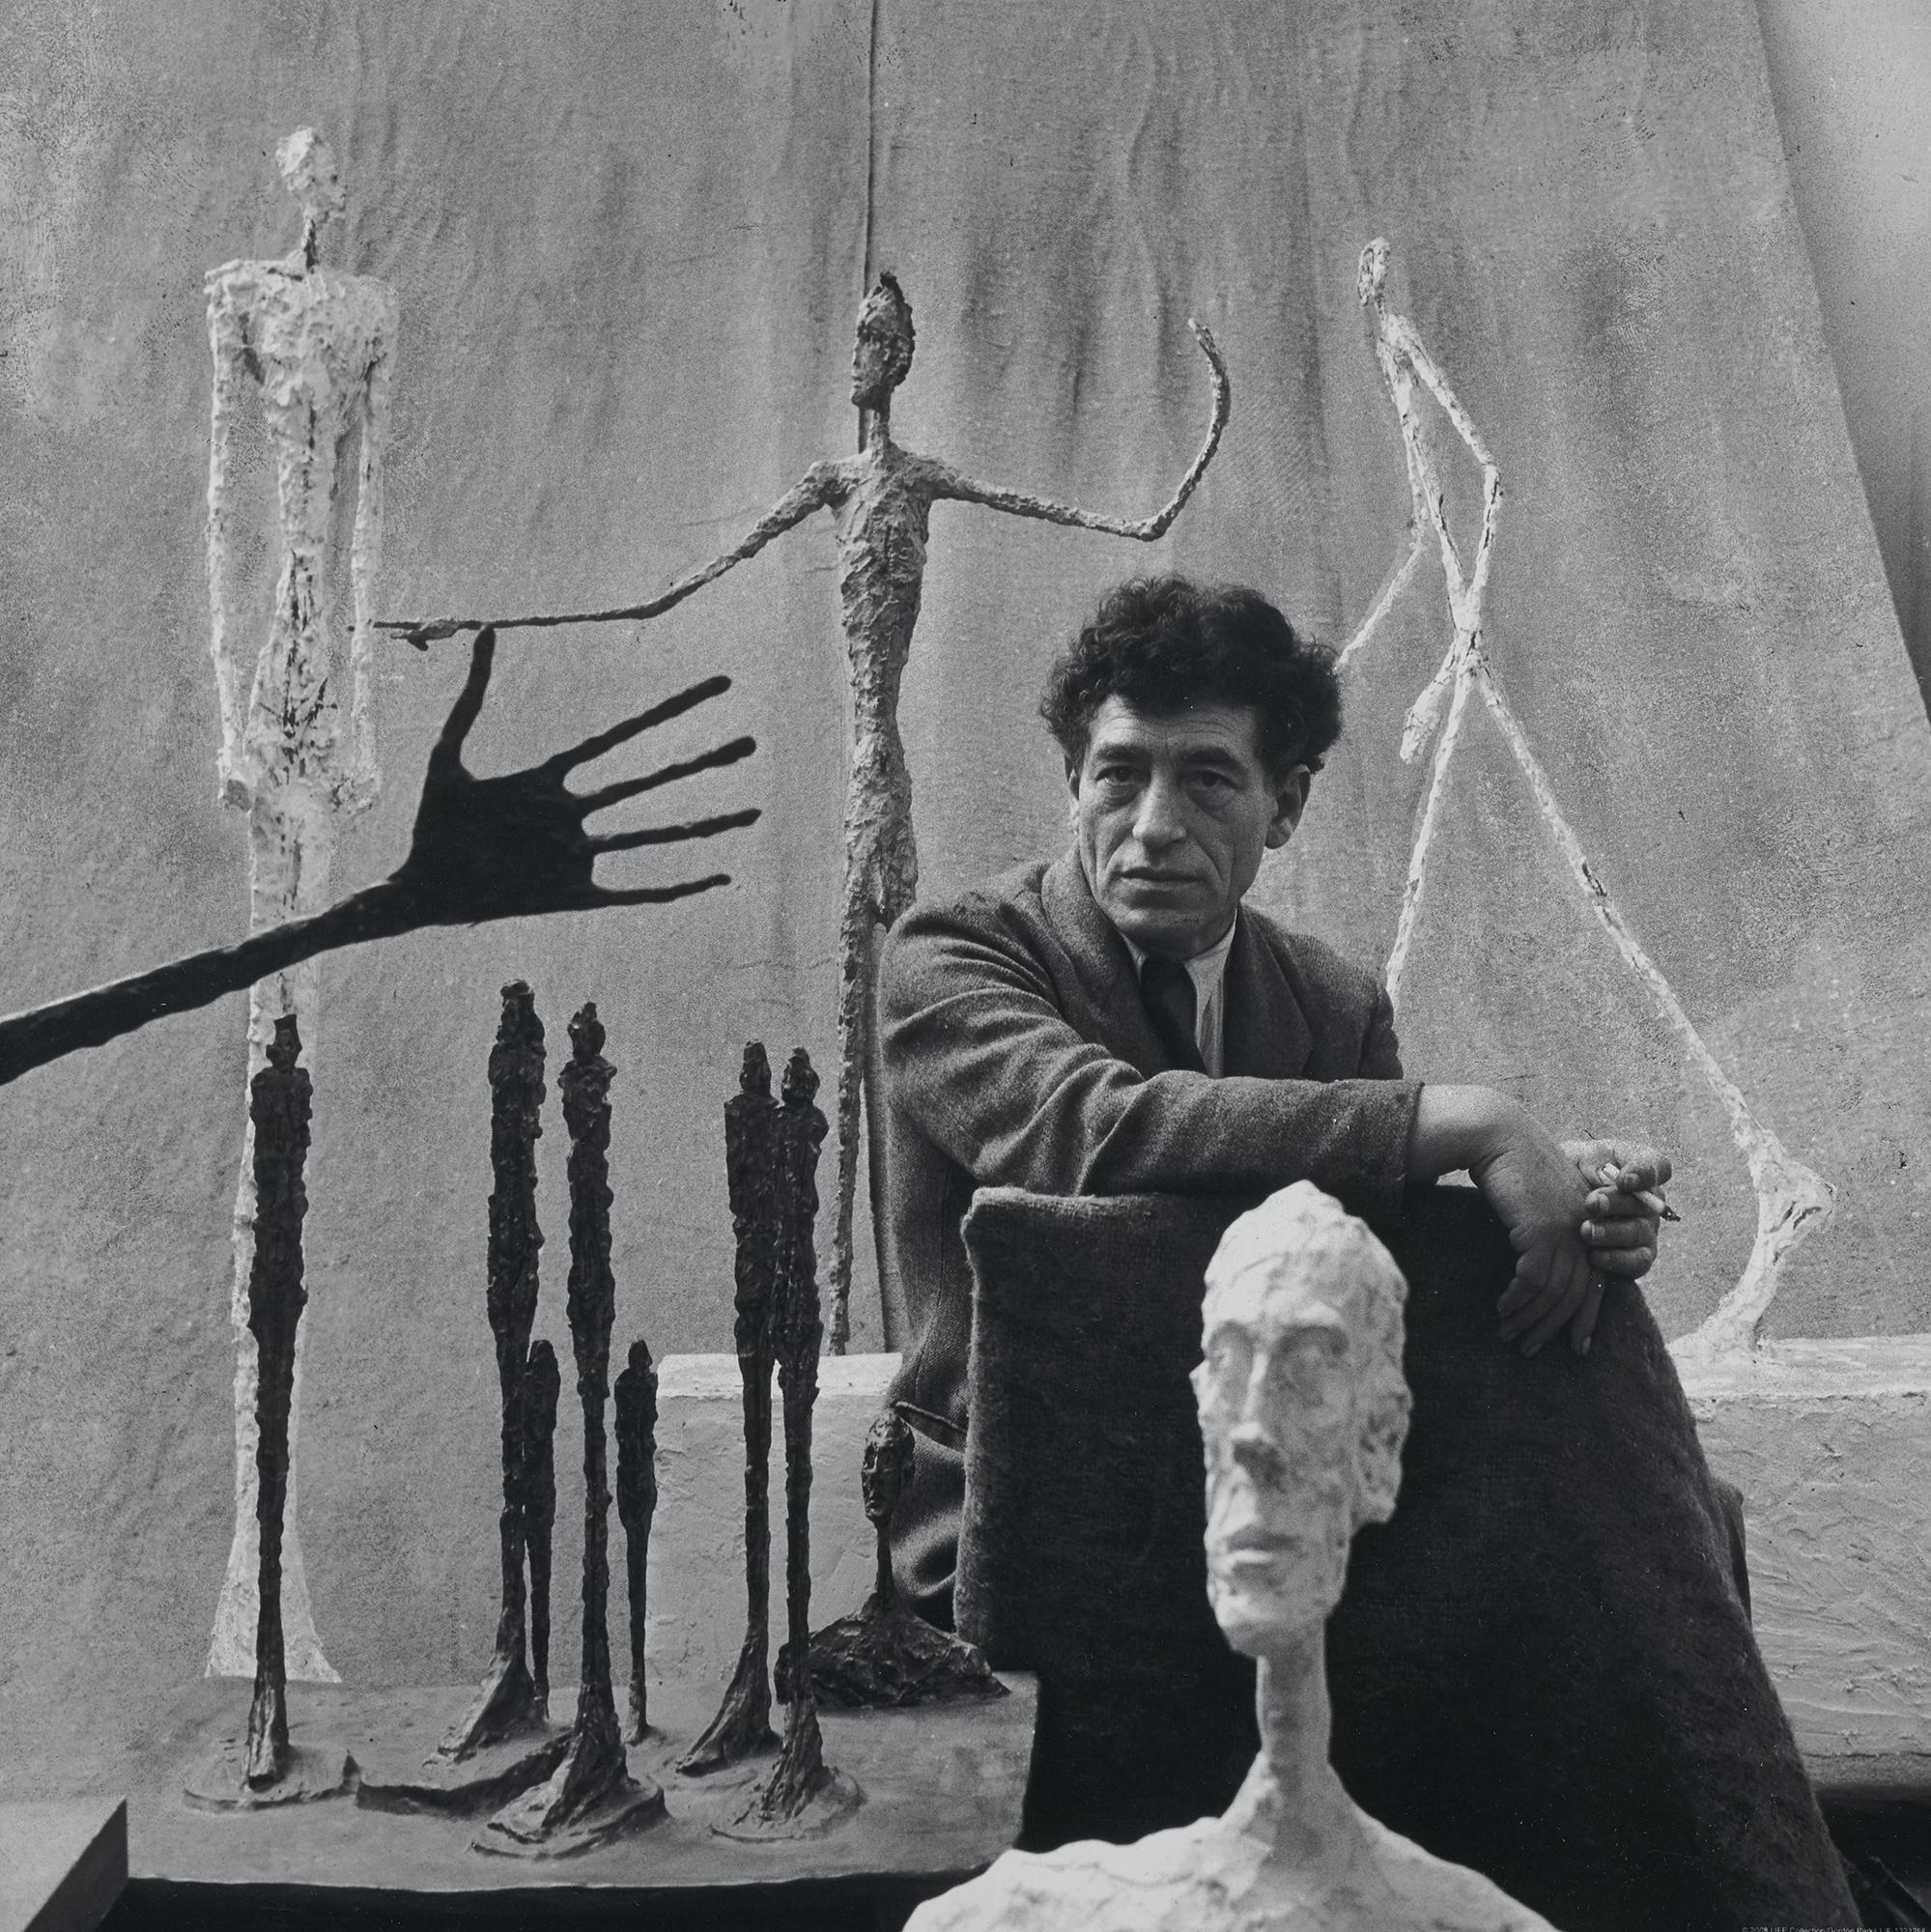 Alberto Giacometti, 1951 Photograph by Gordon Parks Fondation Giacometti, Paris © The Gordon Parks Foundation